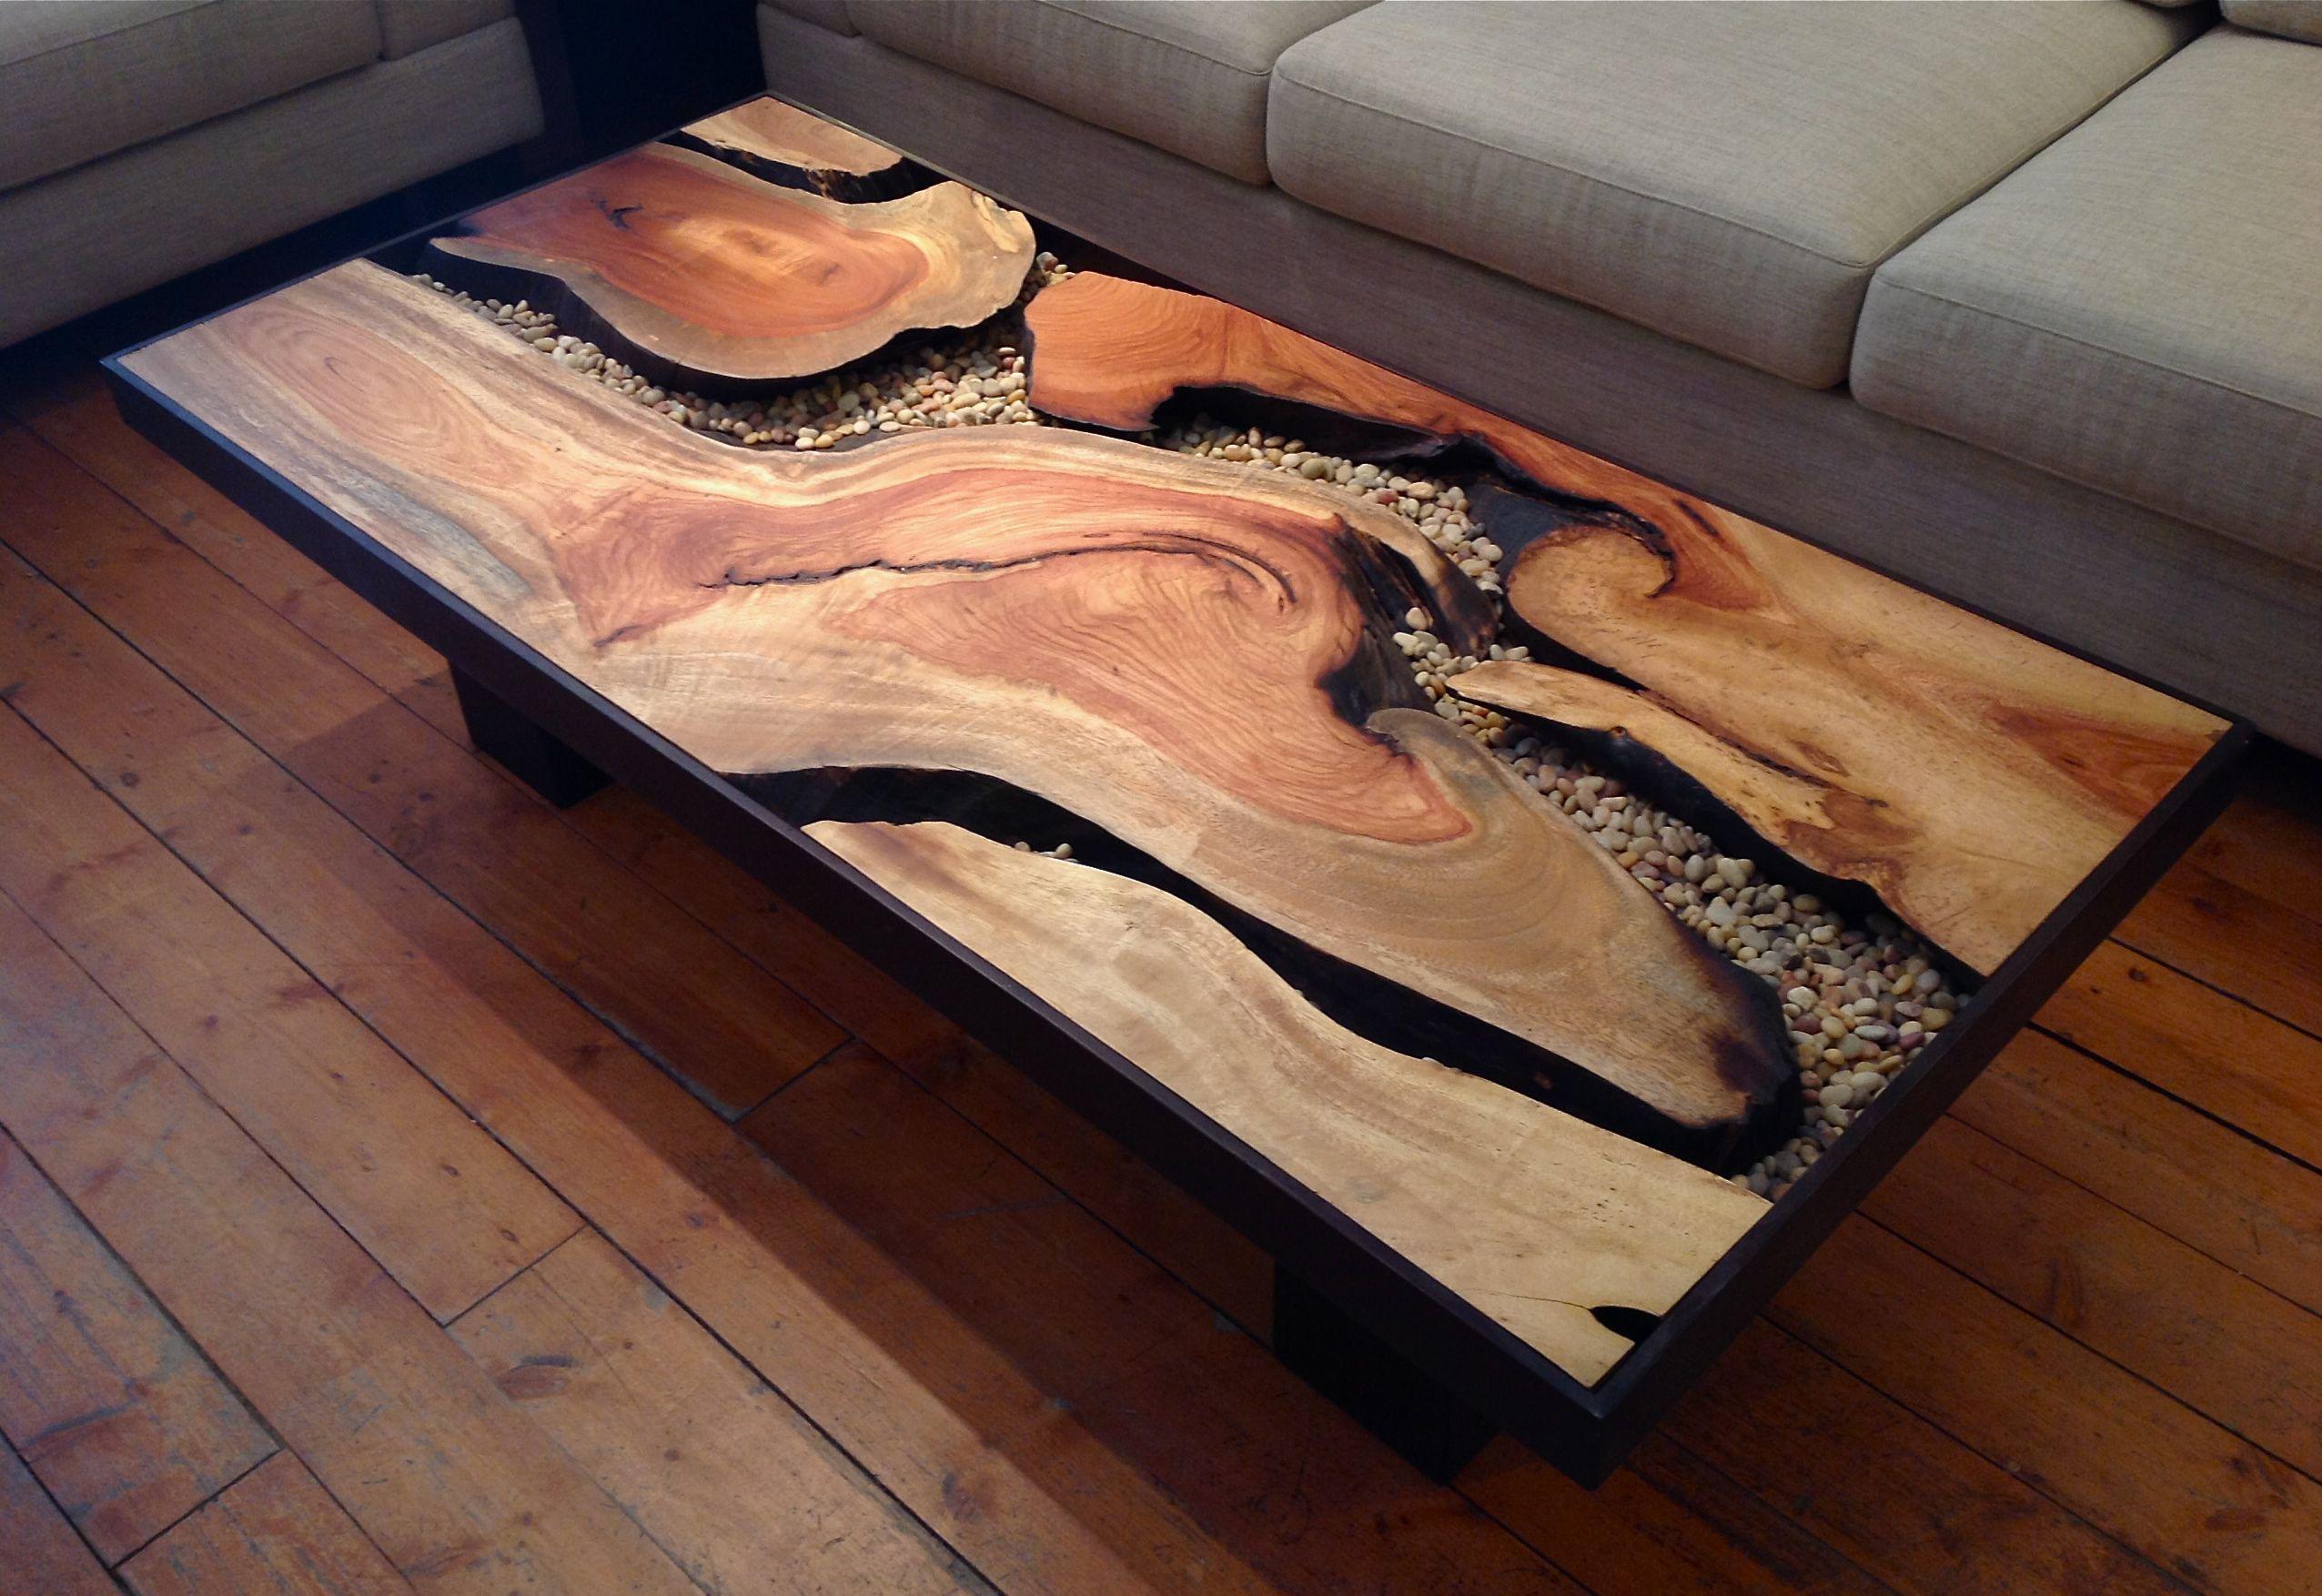 Outdoor Seating Made From Tree Stumps Google Search Couchtisch Holz Deko Ideen Couchtisch Diy